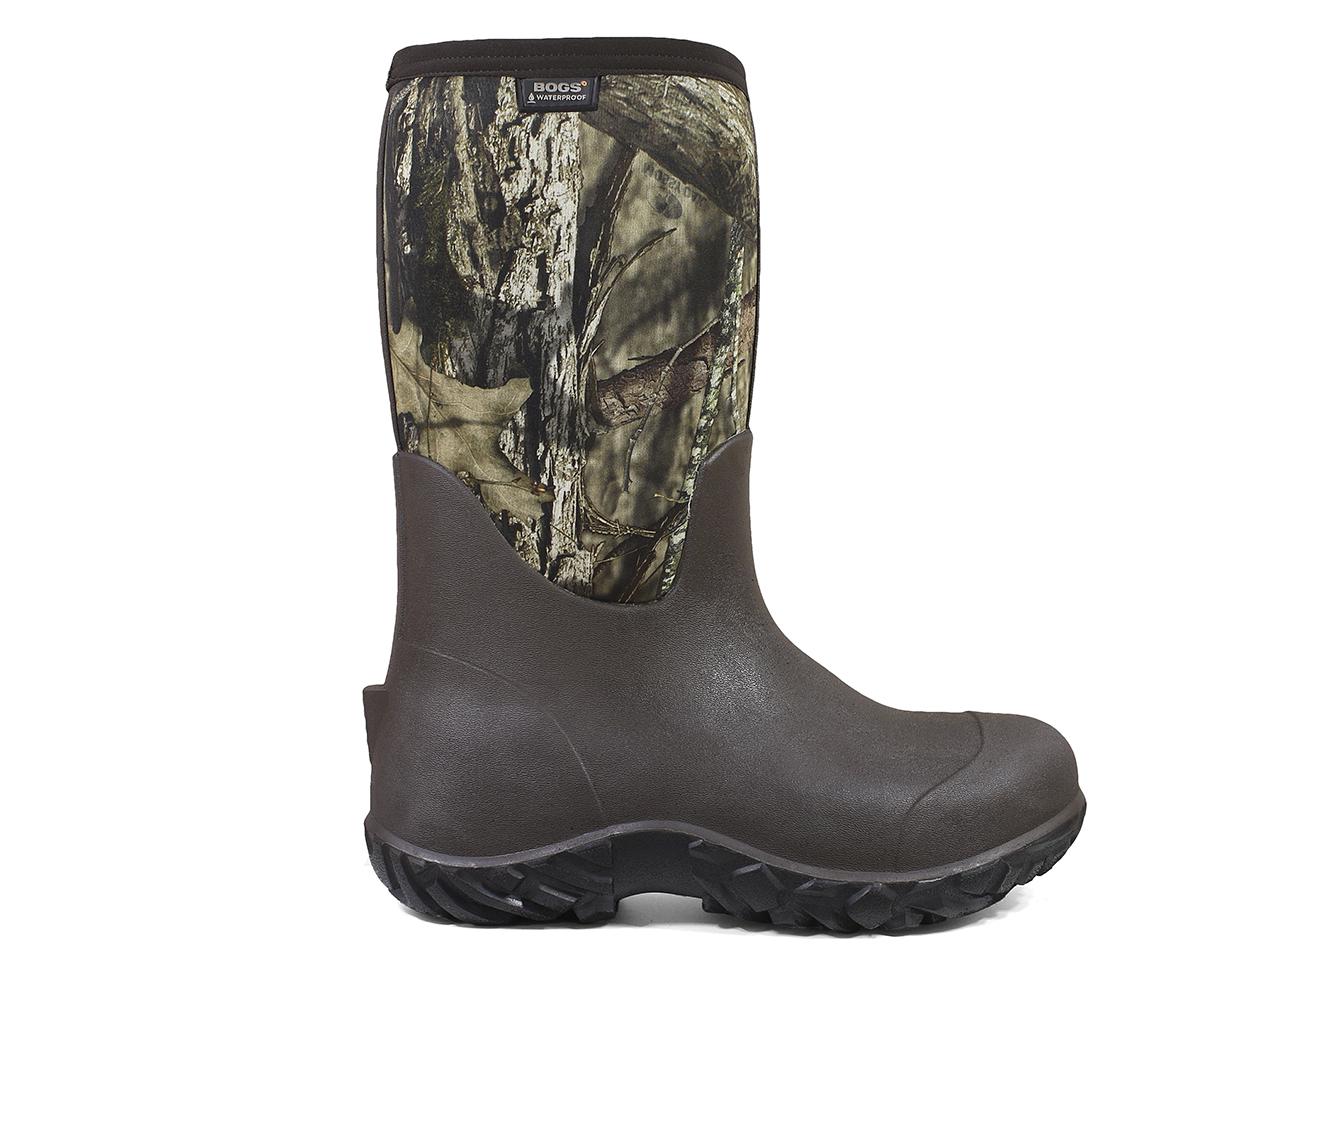 Bogs Footwear Warner Men's Boots (Multi-color Fabric)